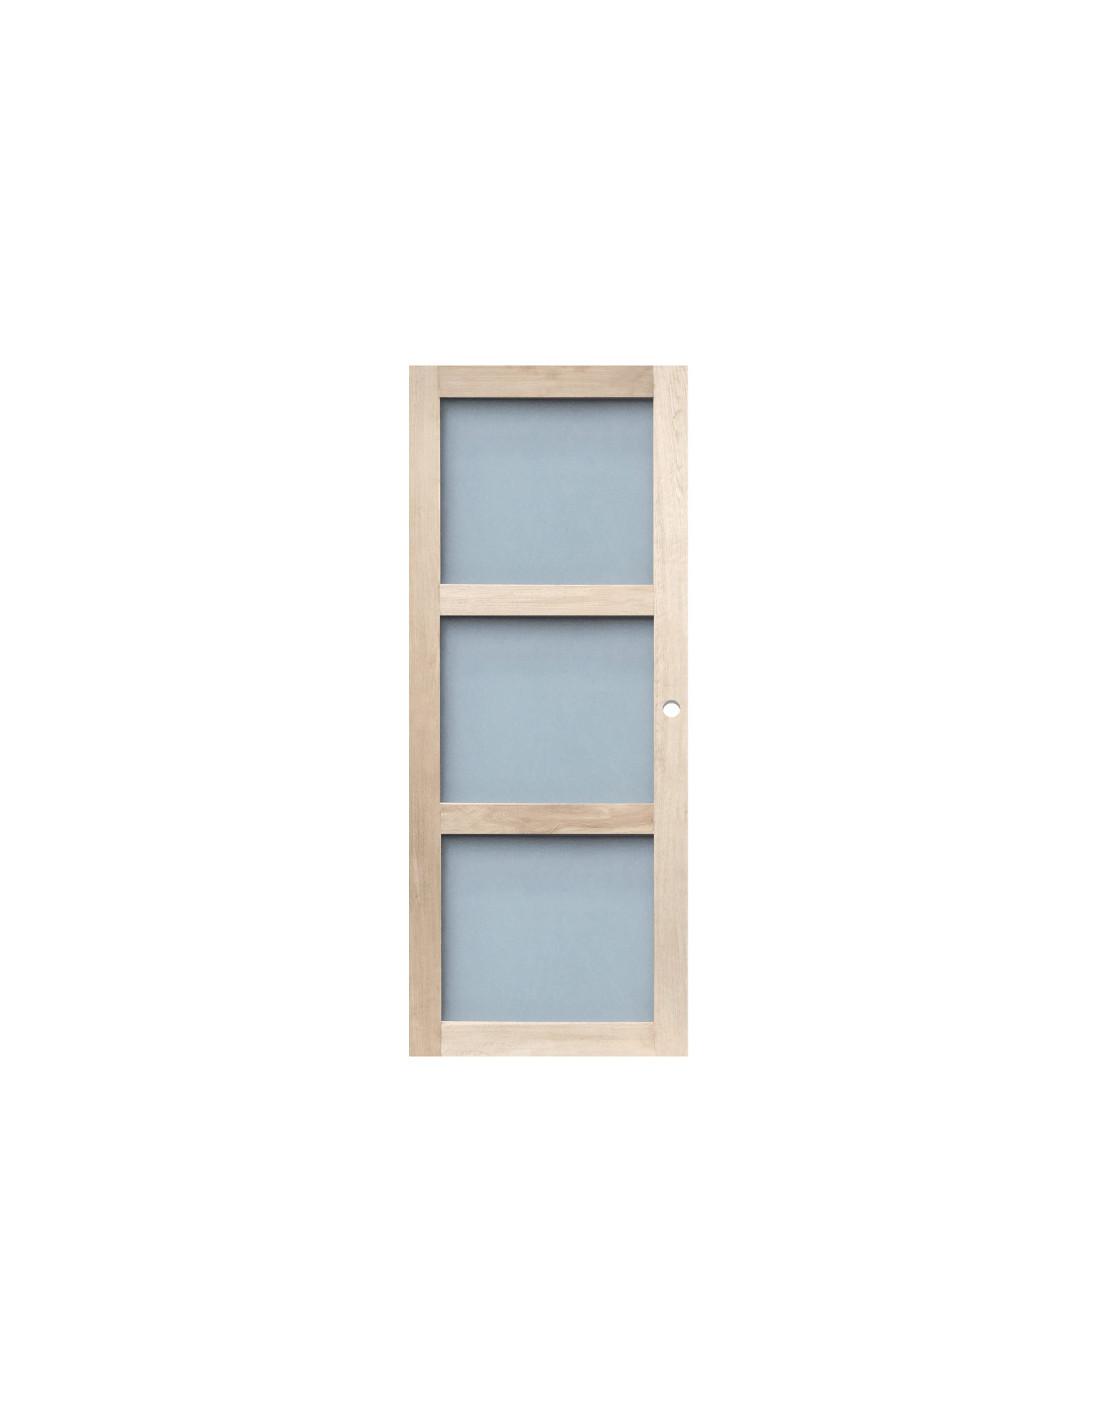 Rb closing porte d int rieur coulissante vitr e ch ne dim for Porte 204x83